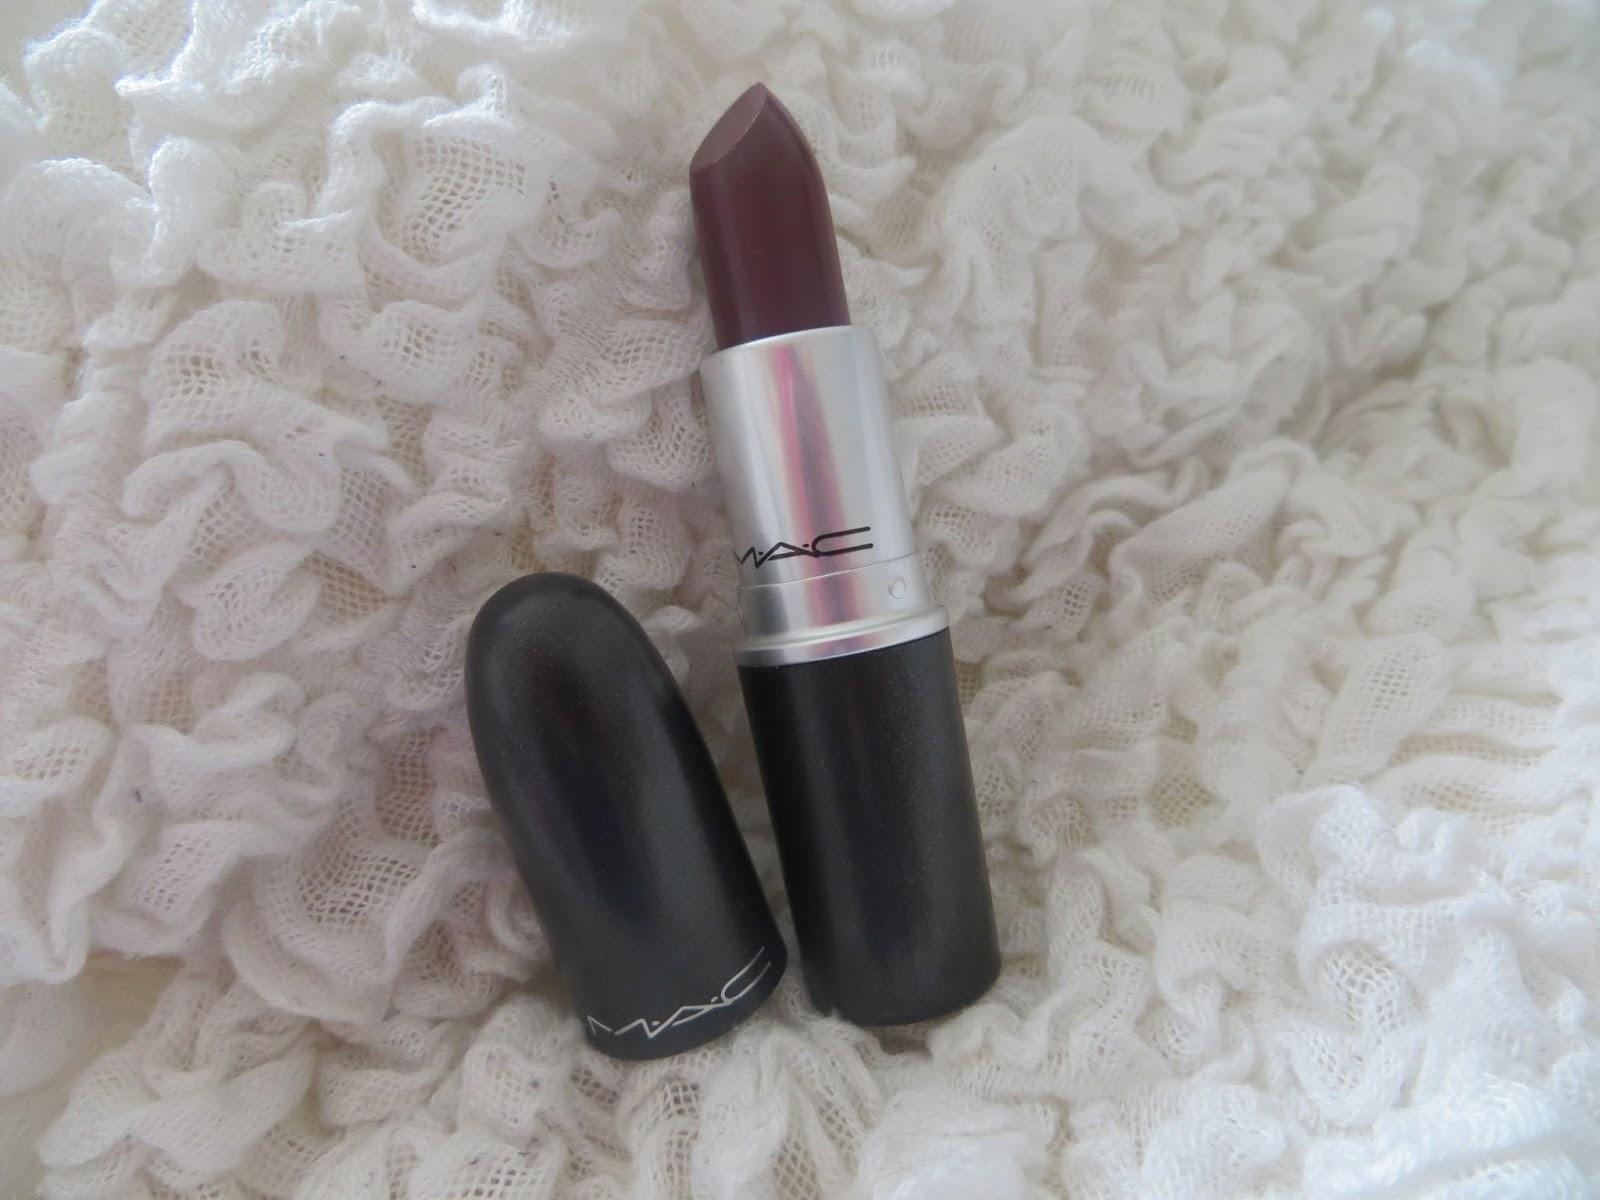 M.A.C Cremesheen Lipstick Hang up (deep